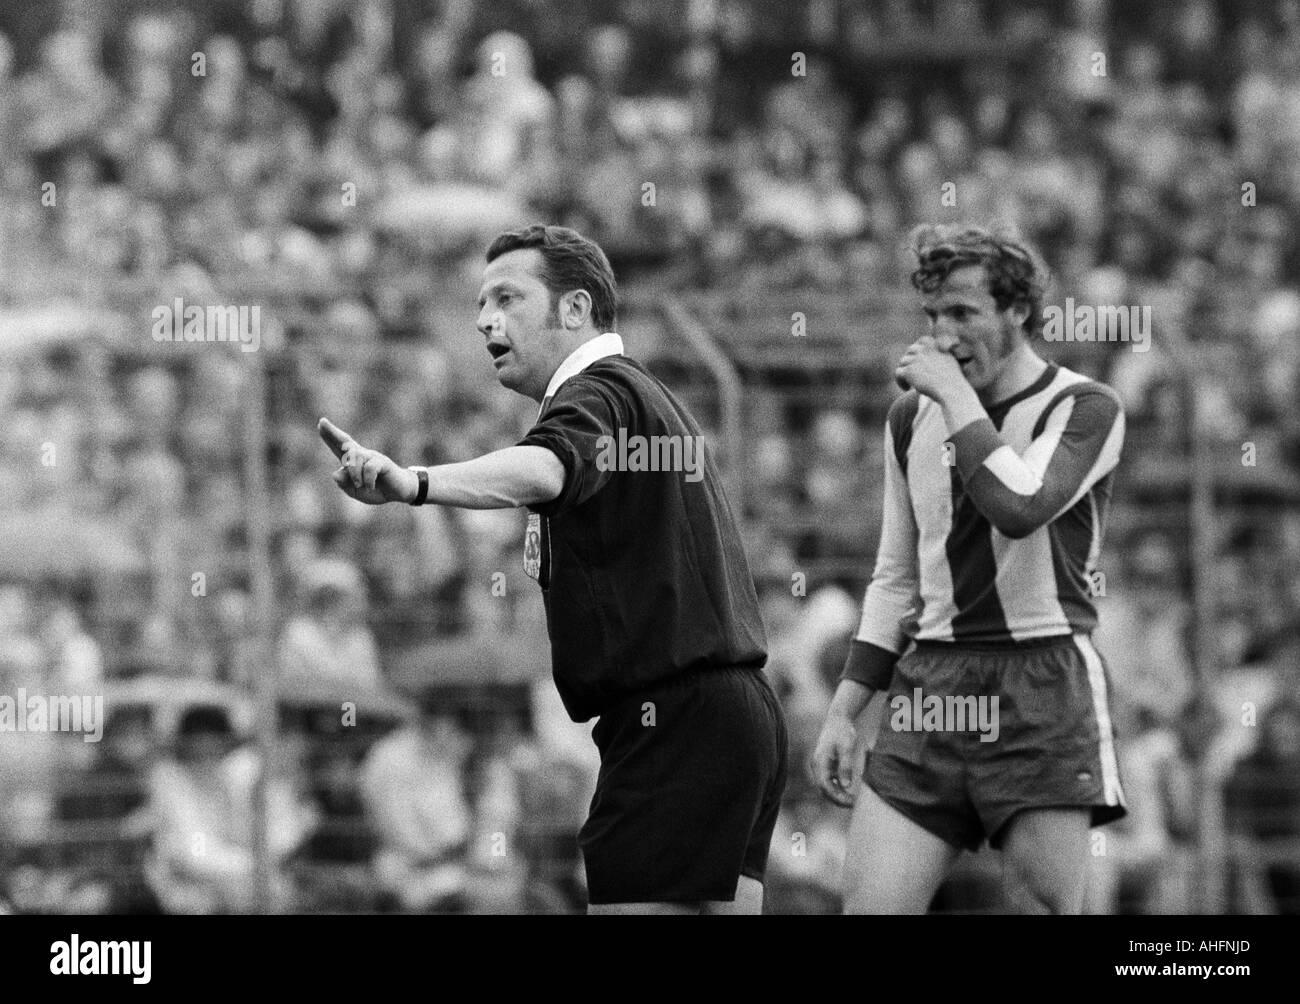 football, Bundesliga, 1971/1972, Stadium Radrennbahn near the Muengersdorfer Stadium in Cologne, 1. FC Cologne versus FC Bayern Munich 1:4, scene of the match, referee Gerhard Schulenburg from Hamburg and Georg Schwarzenbeck (FCB) - Stock Image